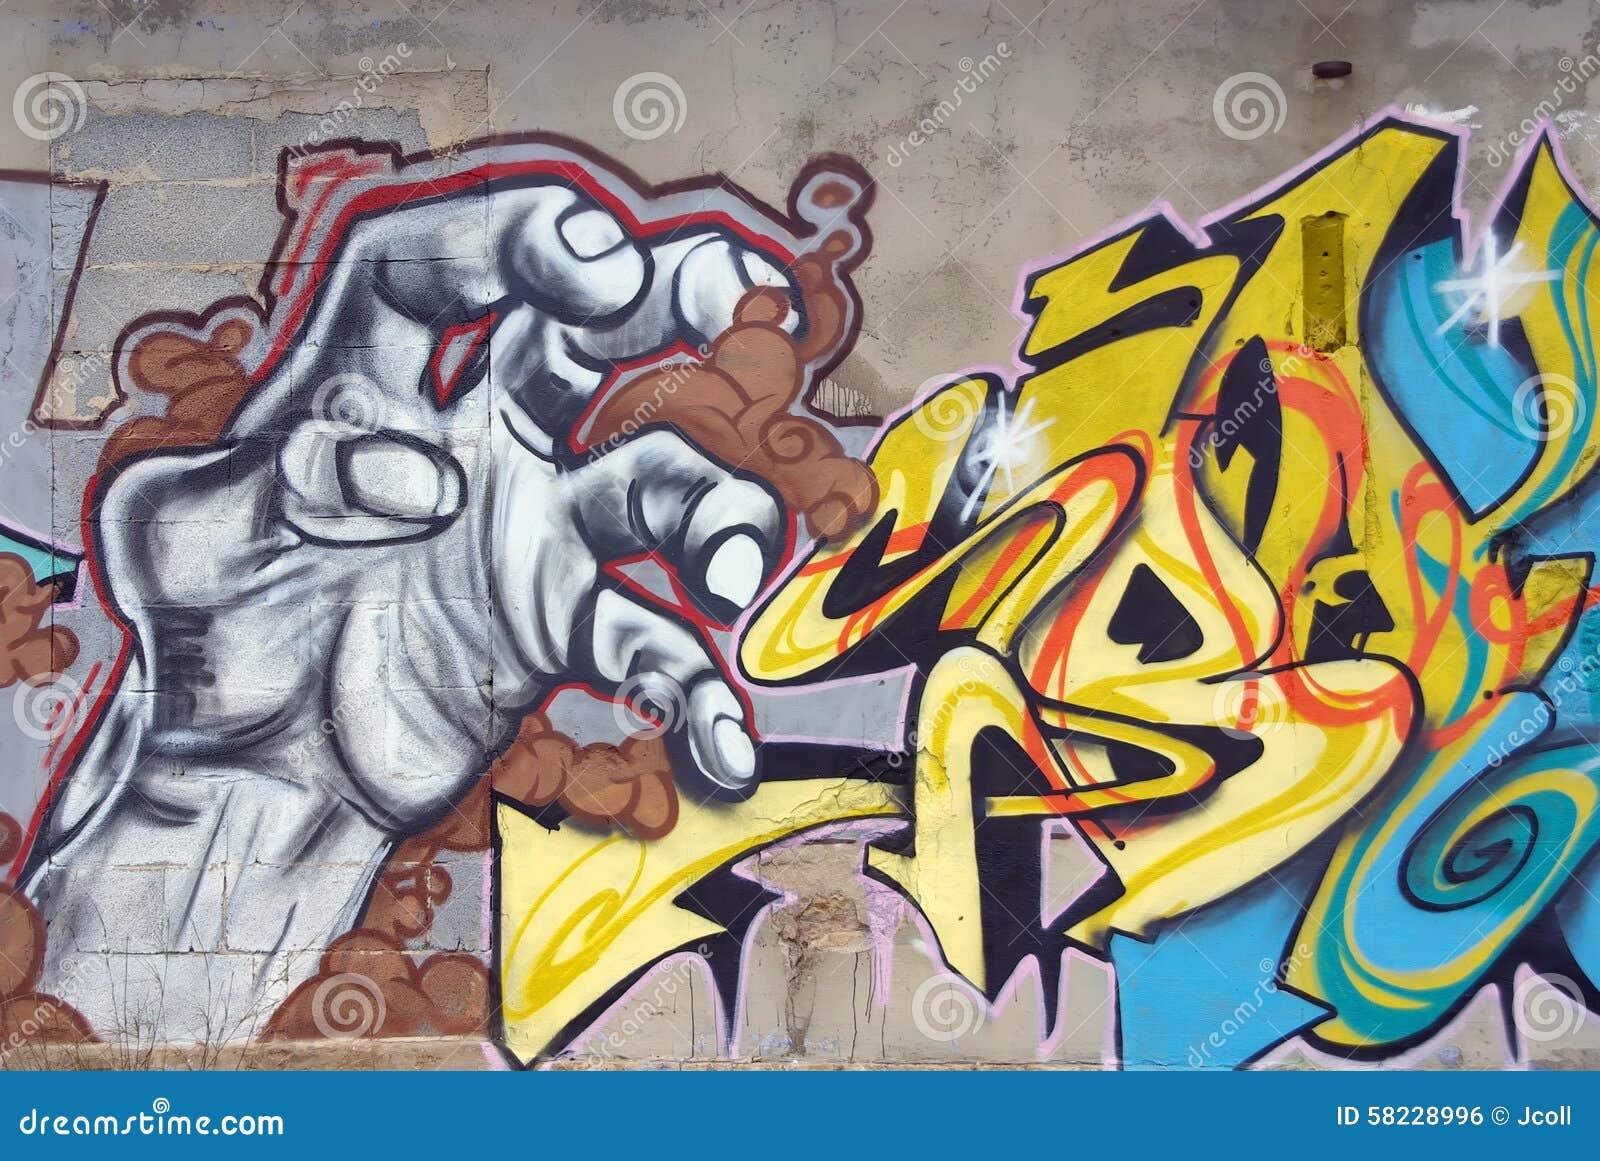 graffitti editorial photo image of city creativity 58228996